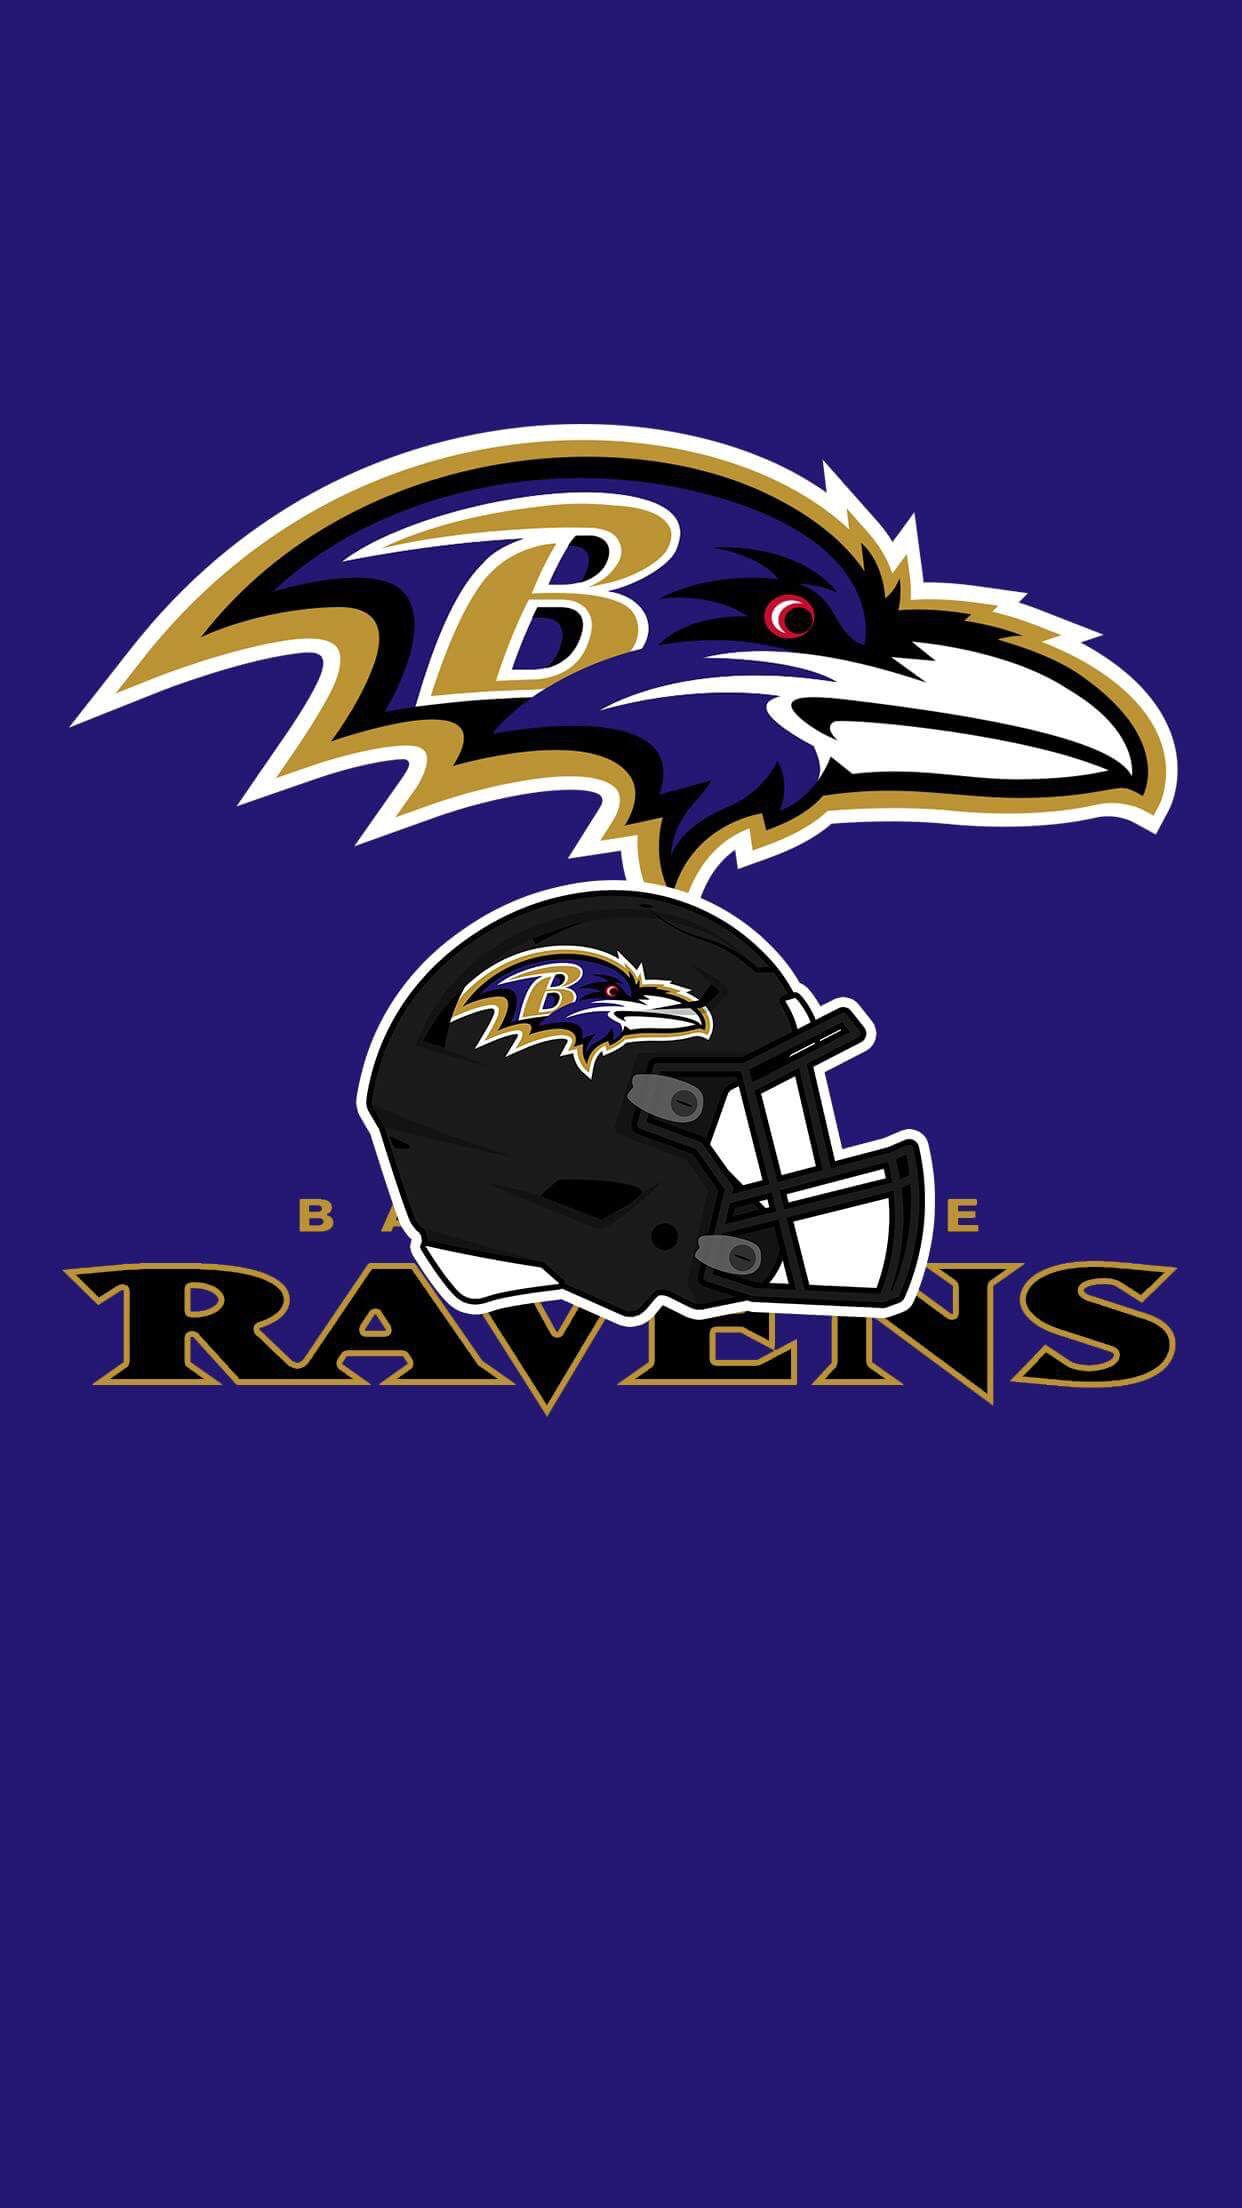 Pin by James DeBaggis on NFL logos Ravens football, Nfl